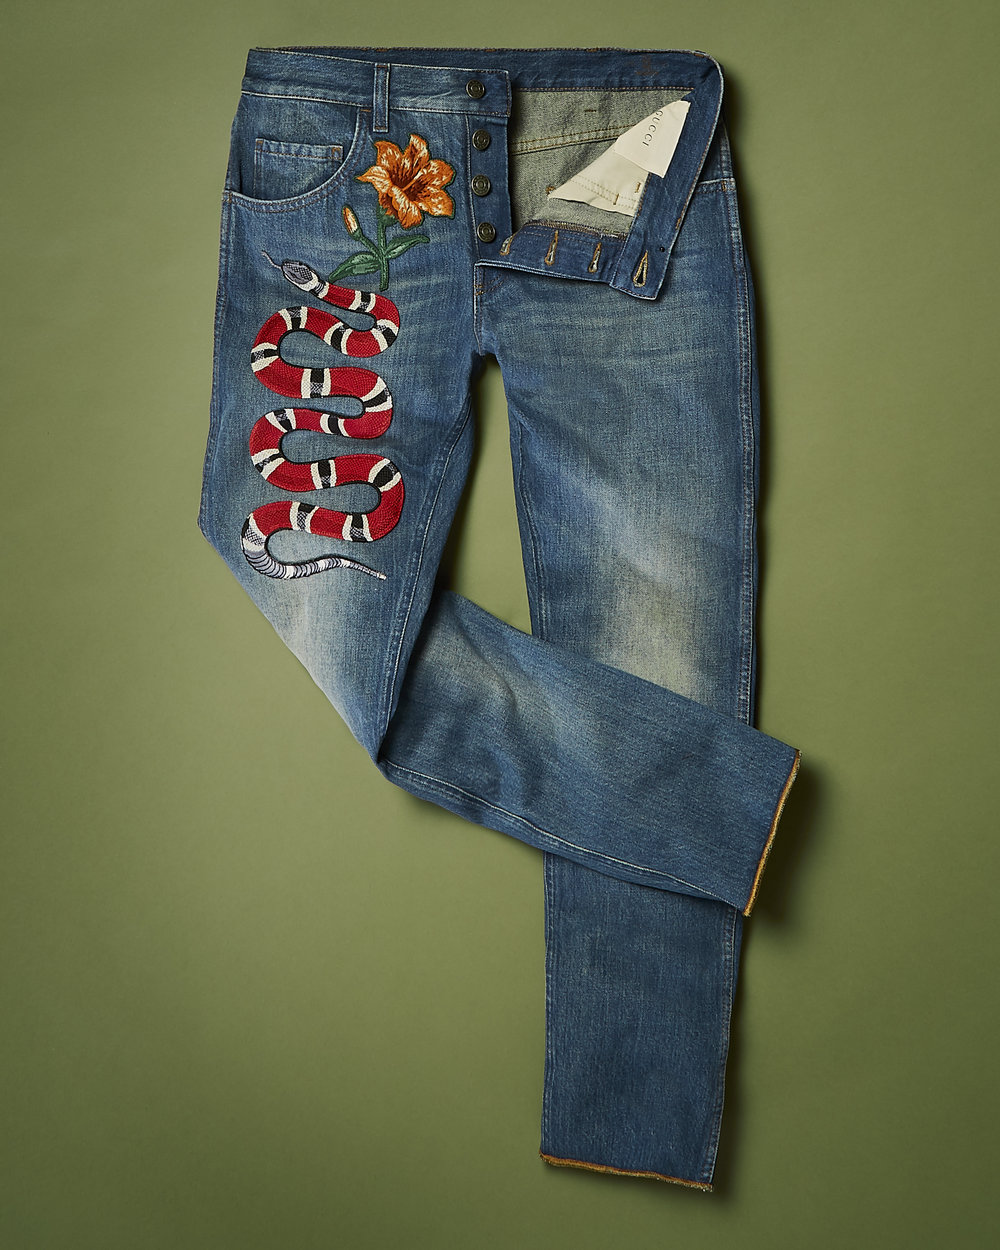 Gucci Jeans #2